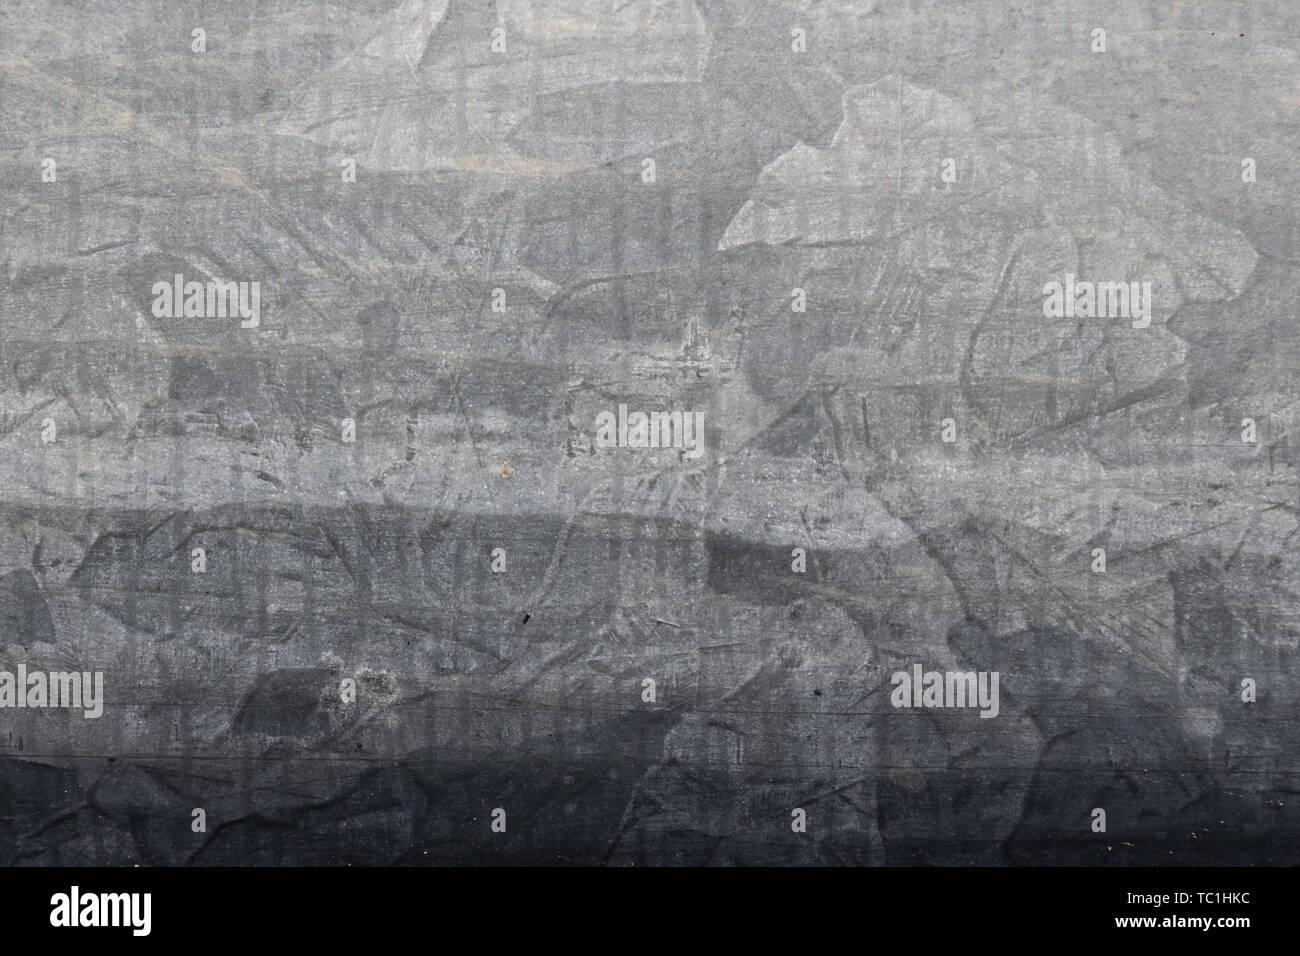 Galvanized gray metal surface texture - Stock Image